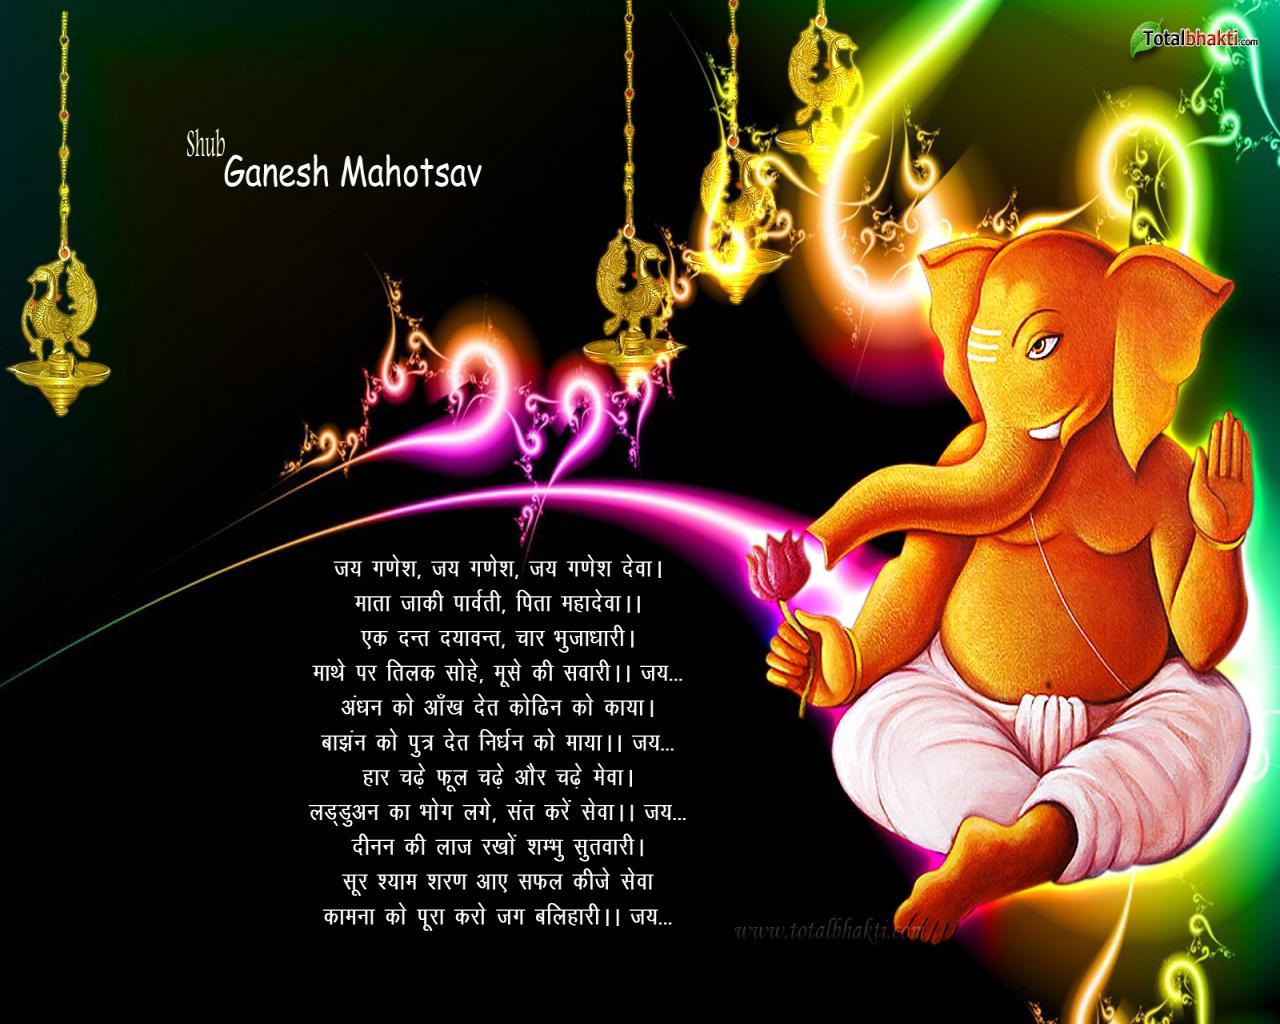 Wallpaper download ganesh -  1280x1024 Px